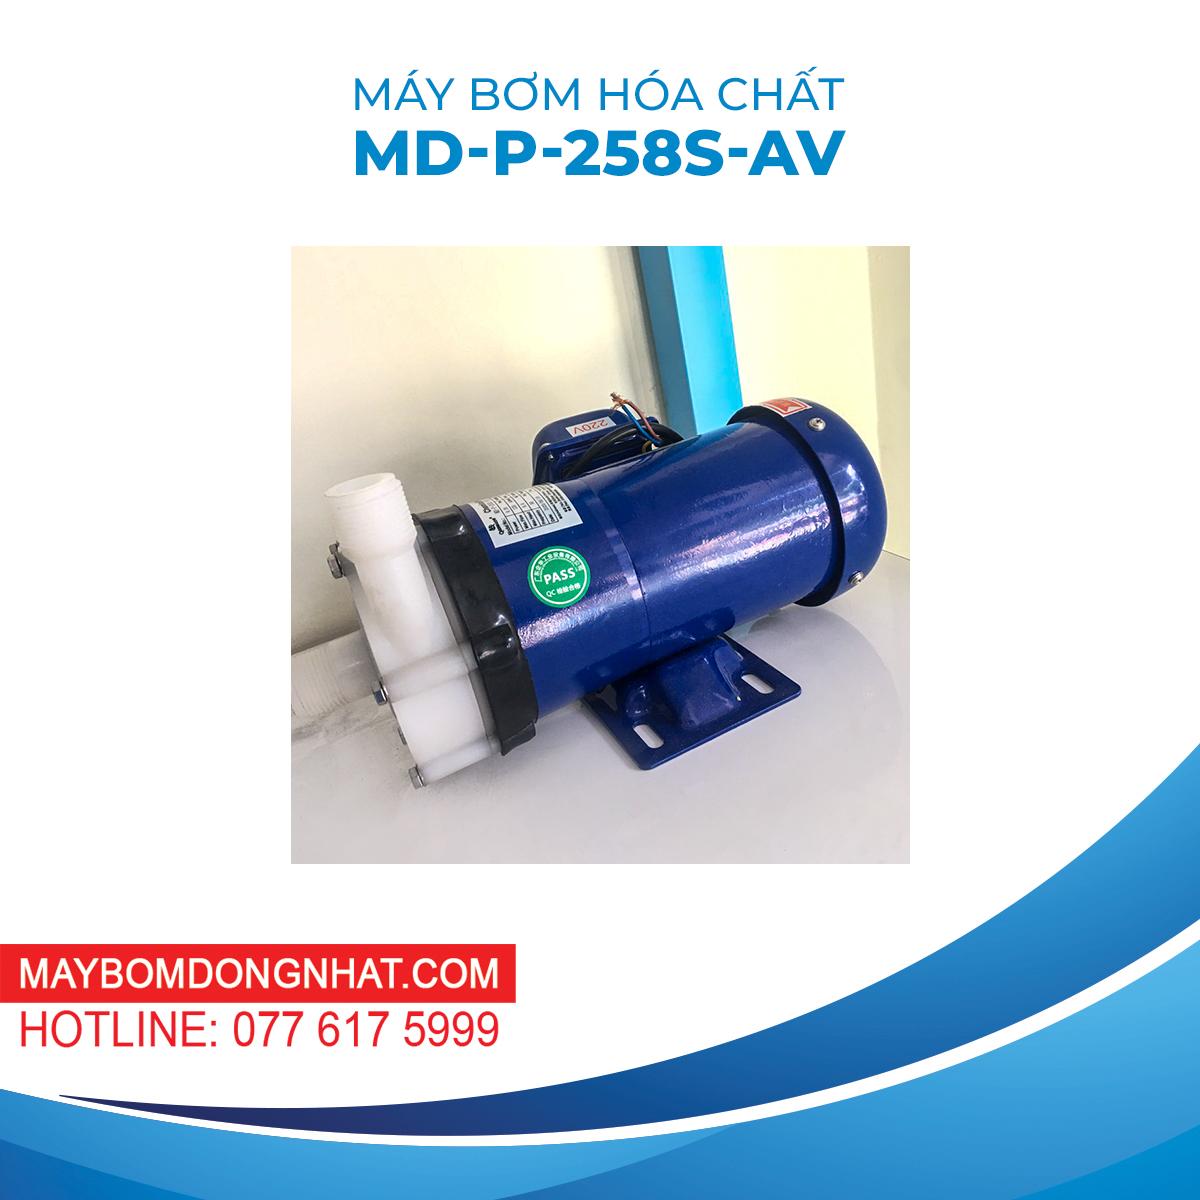 Máy Bơm Hóa Chất MD-P-258S-AV 220V 260W 135L/P